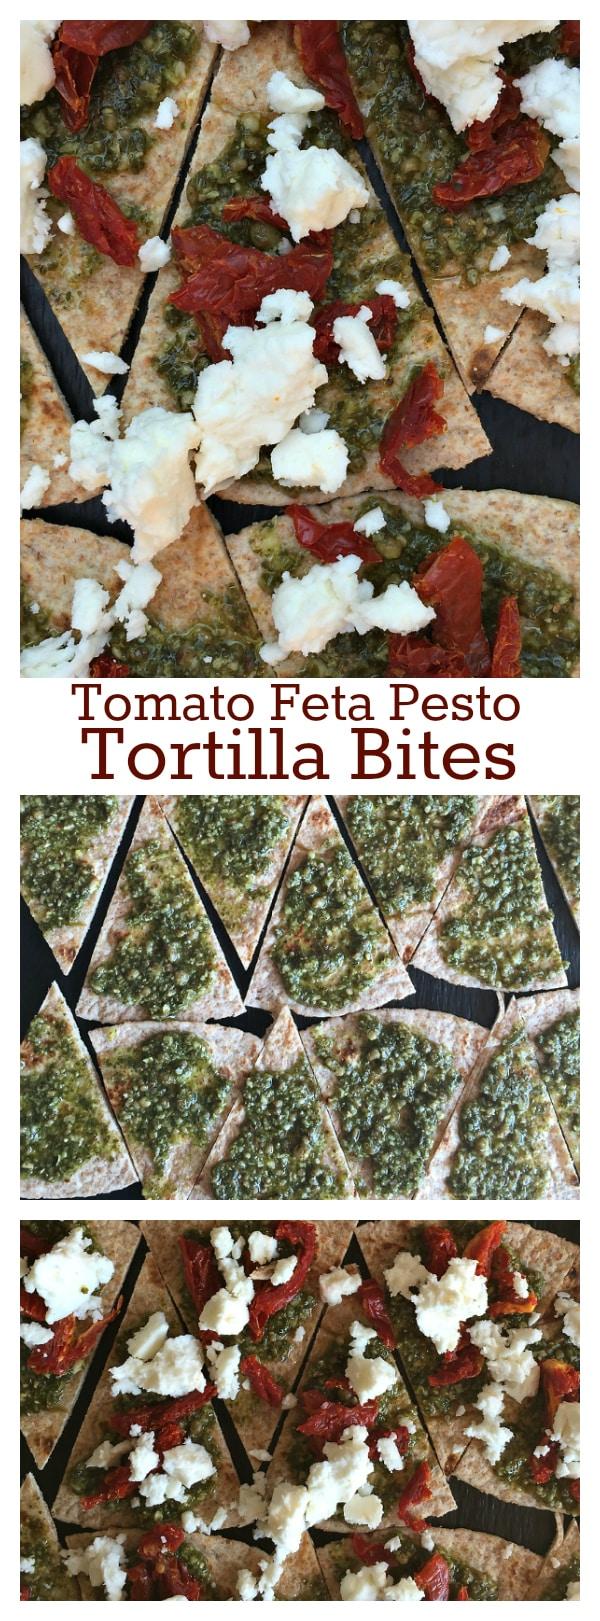 Tomato Feta Pesto Tortilla Bites - easy appetizer recipe